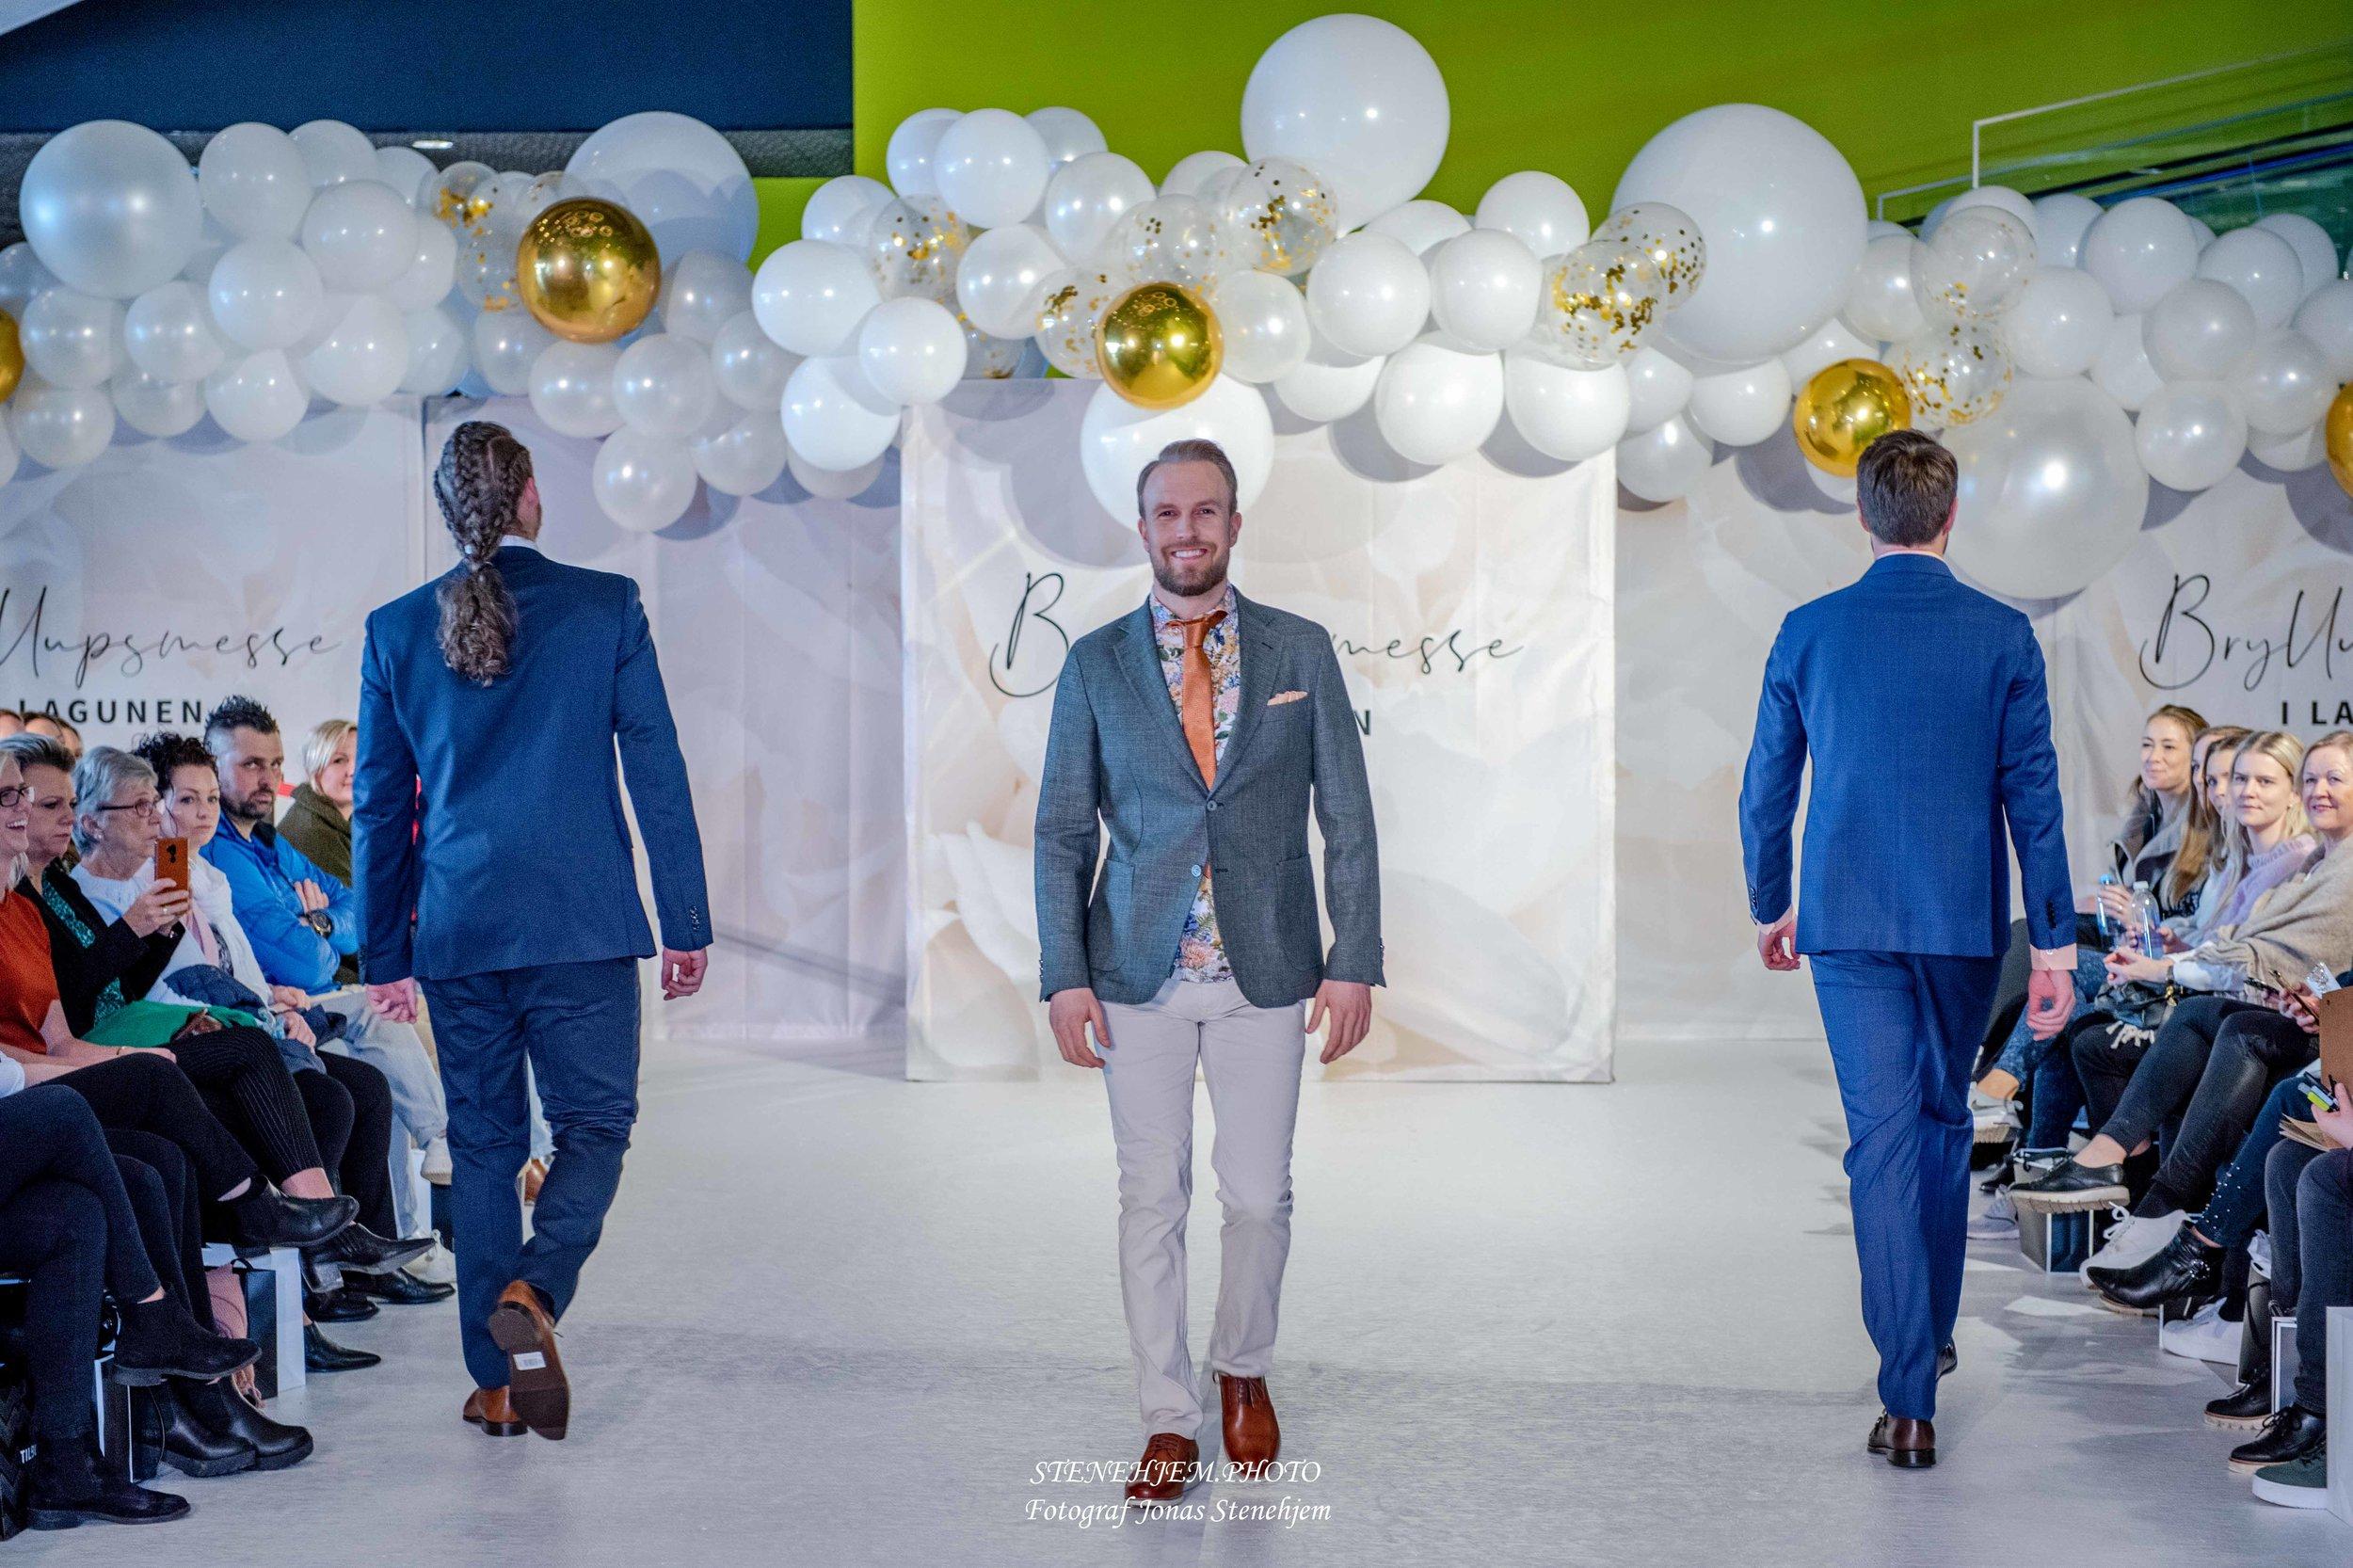 Bryllupsmesse_Lagunen_mittaltweddingfair__036.jpg